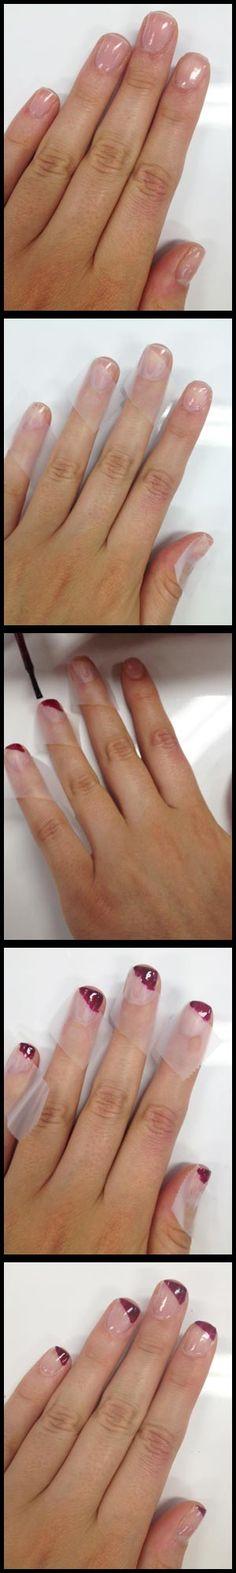 How To: Bias-Cut Nail Art http://primped.com.au/how-tos/hands-nails-how-tos/how-to-bias-cut-nail-art